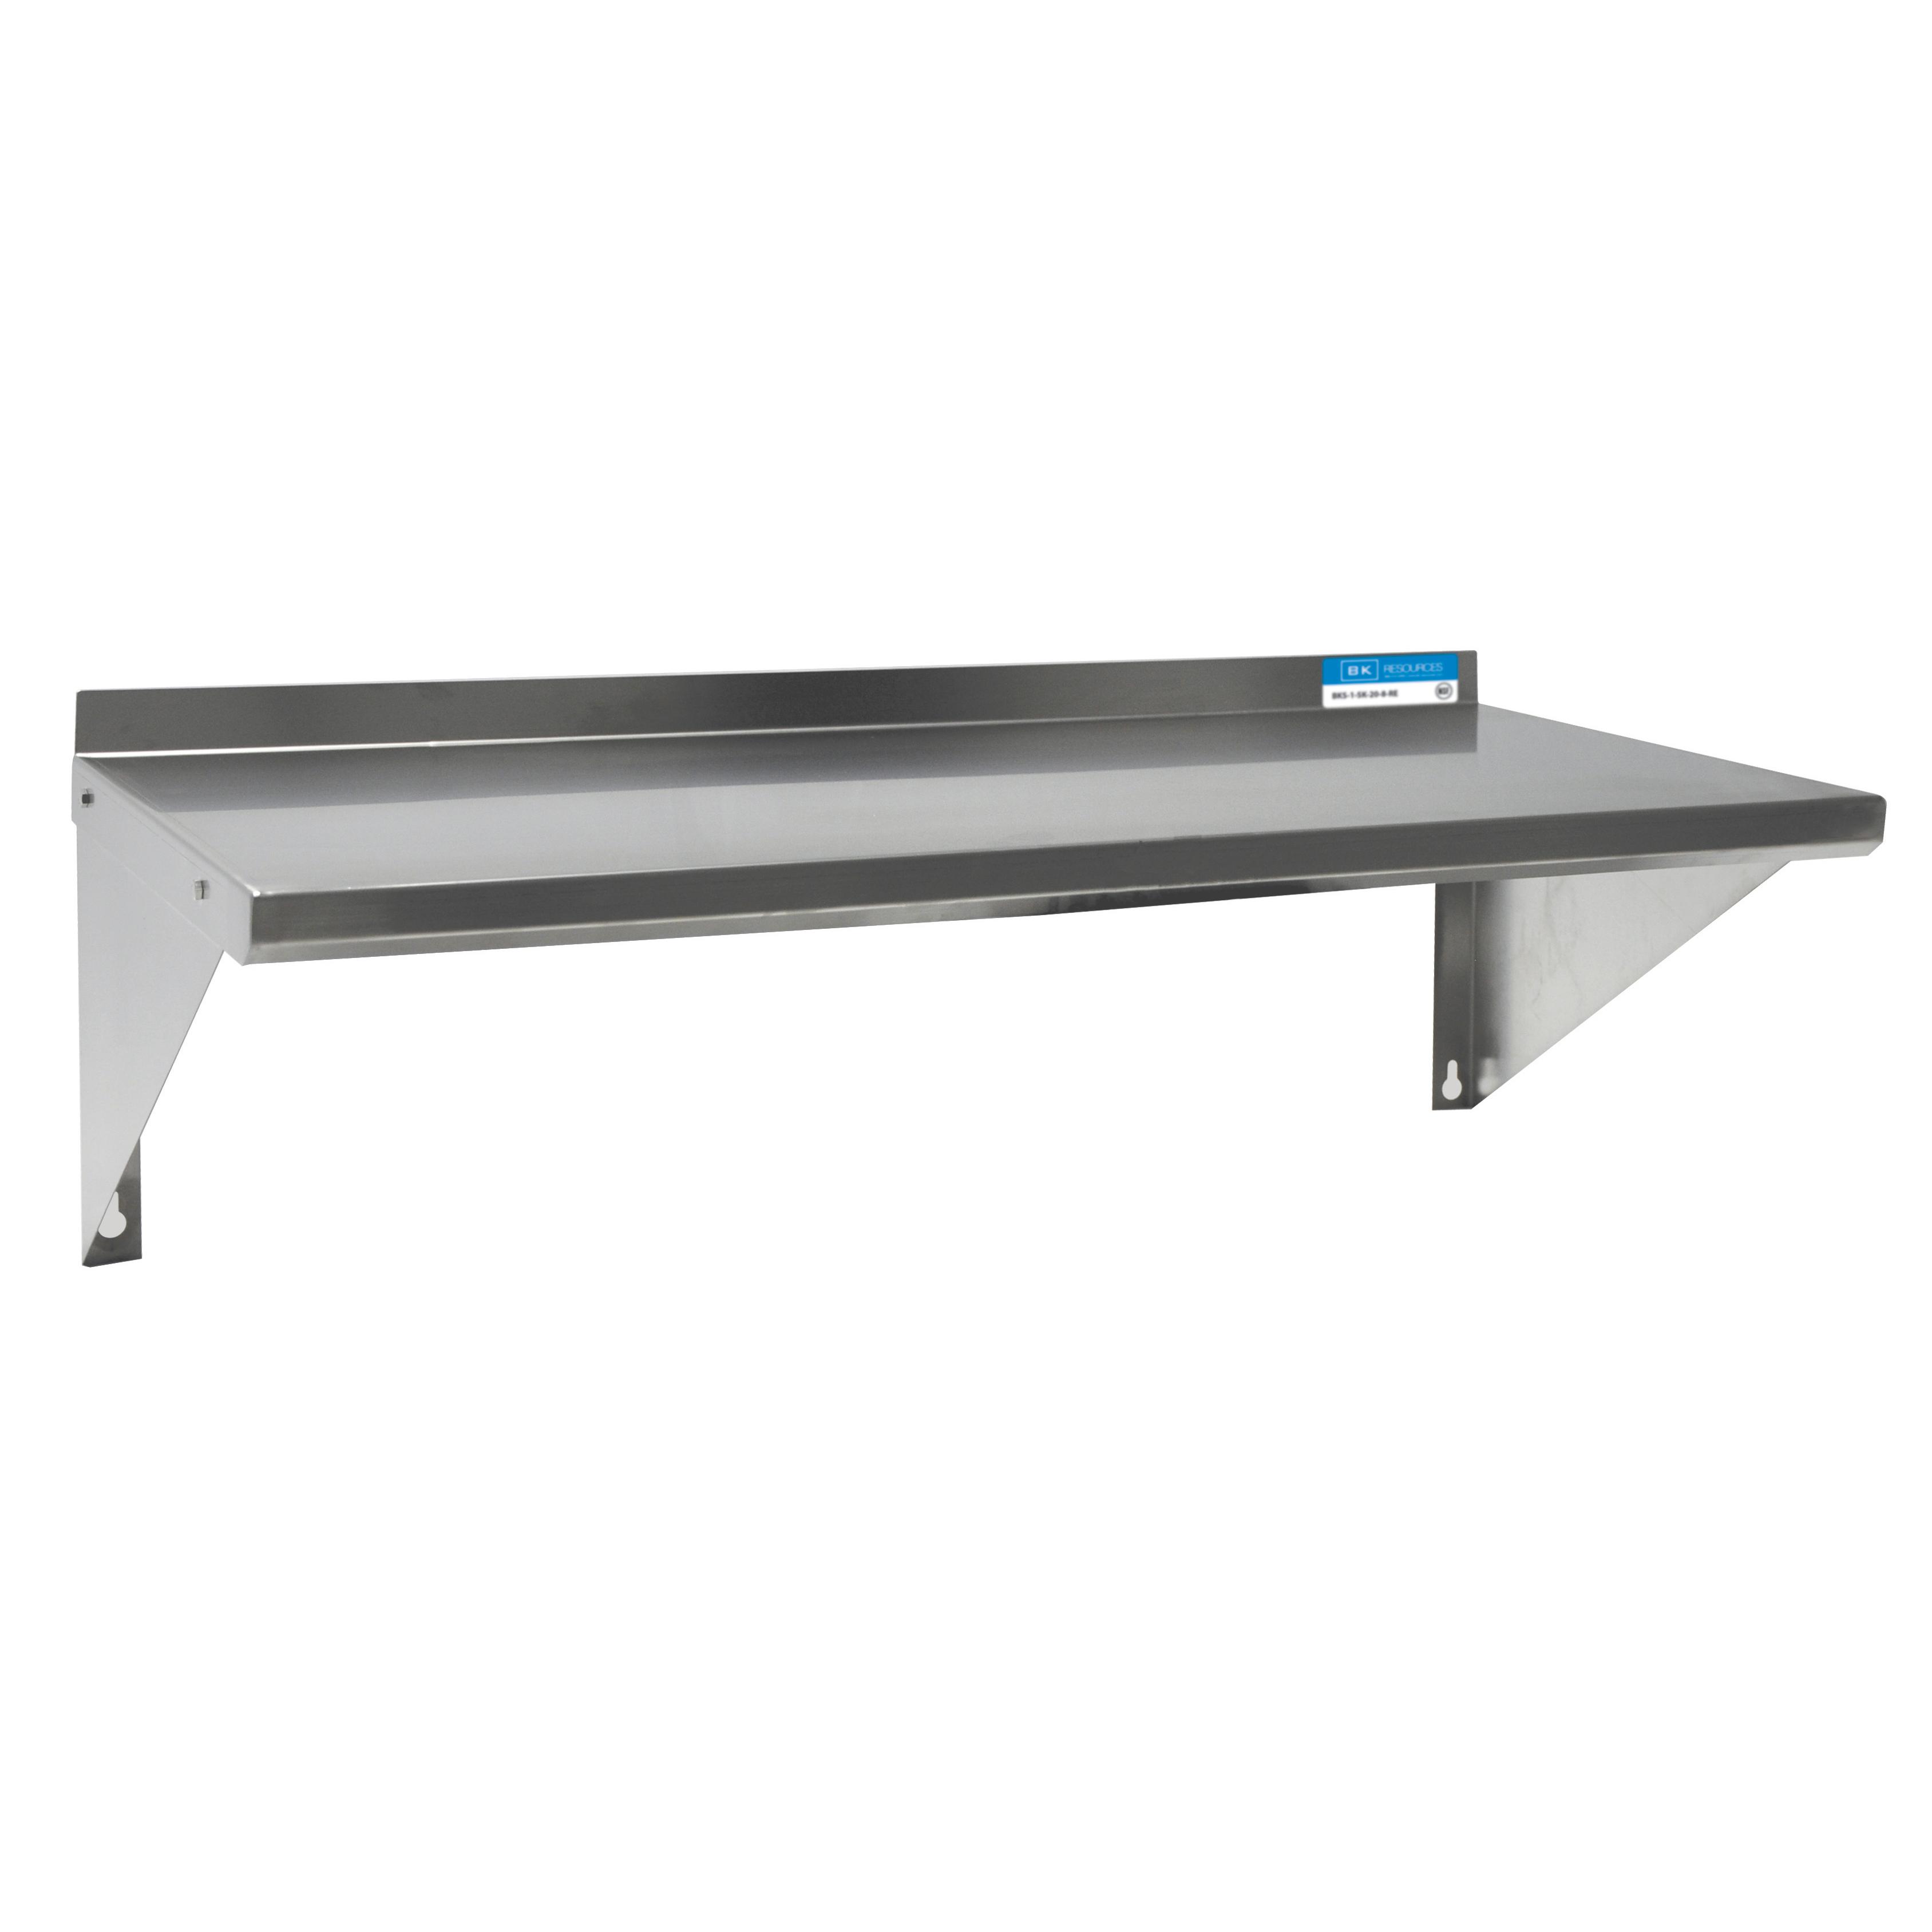 BK Resources BKWS6-1460 shelving, wall mounted